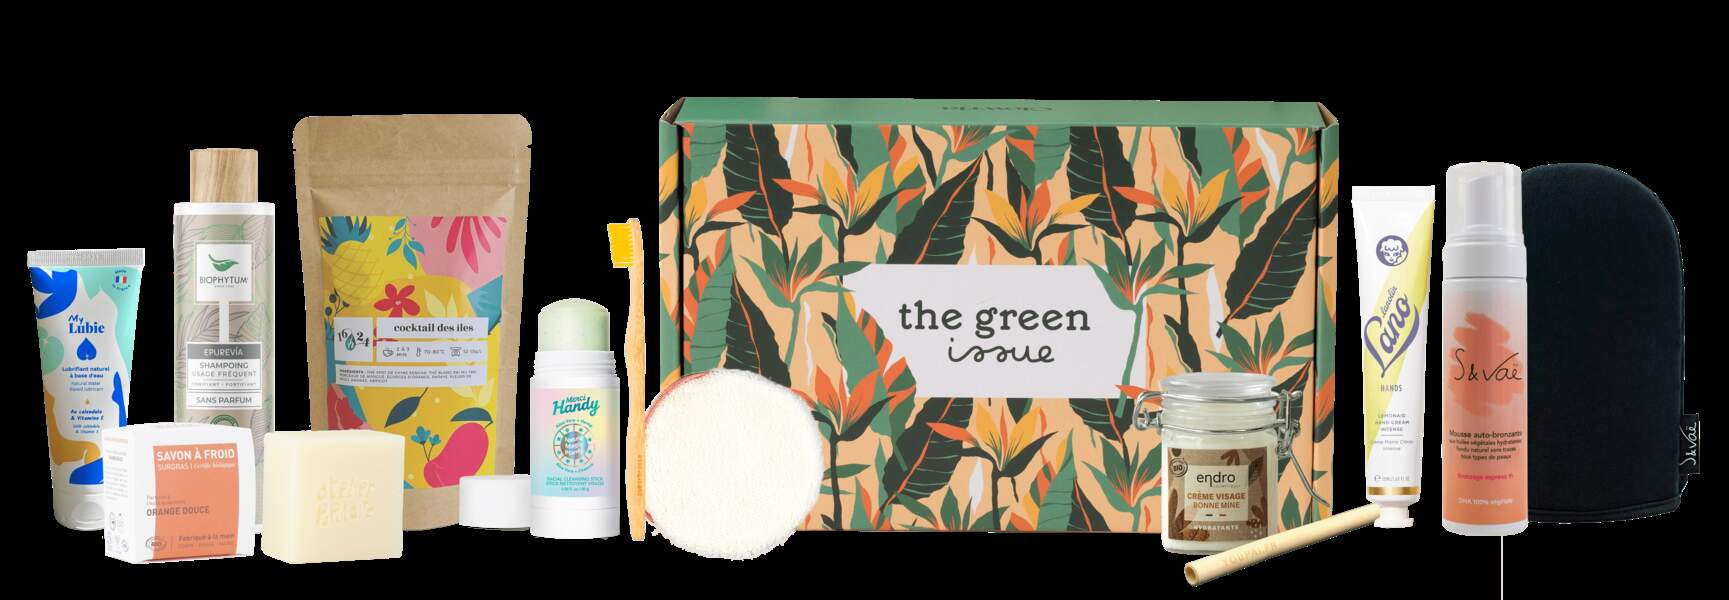 Box green issue : Glowria